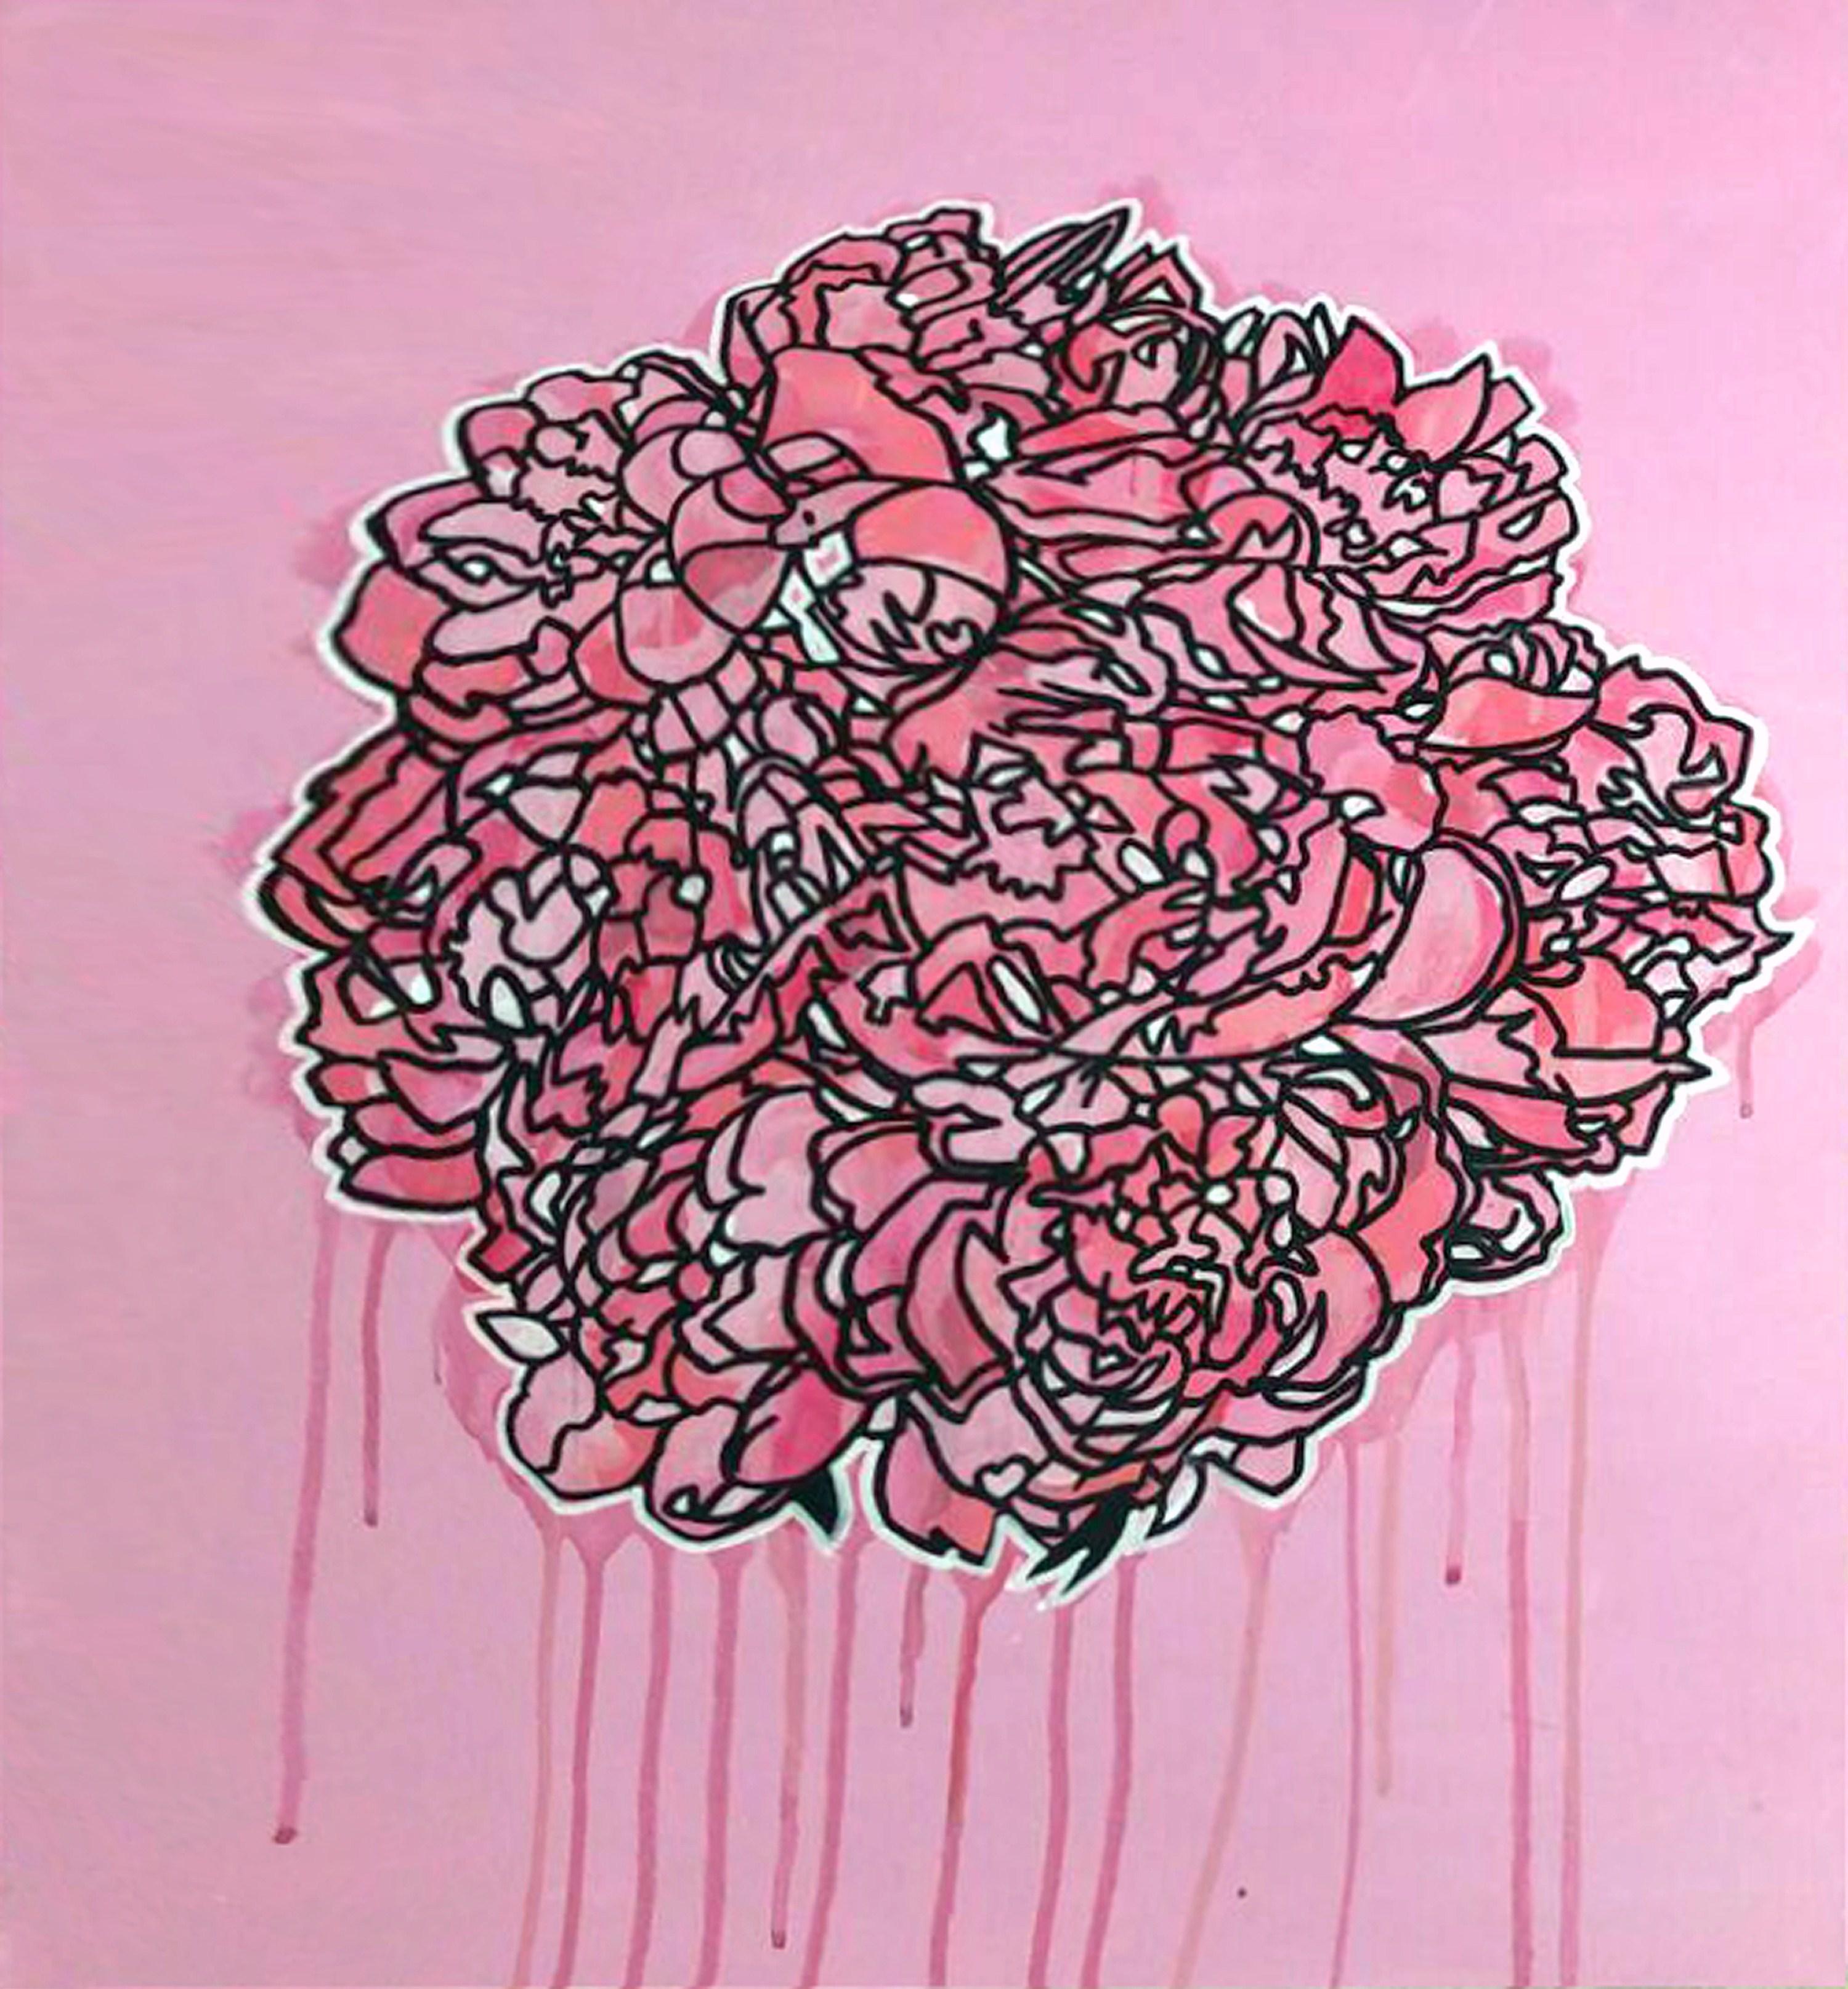 Flower 3 sold